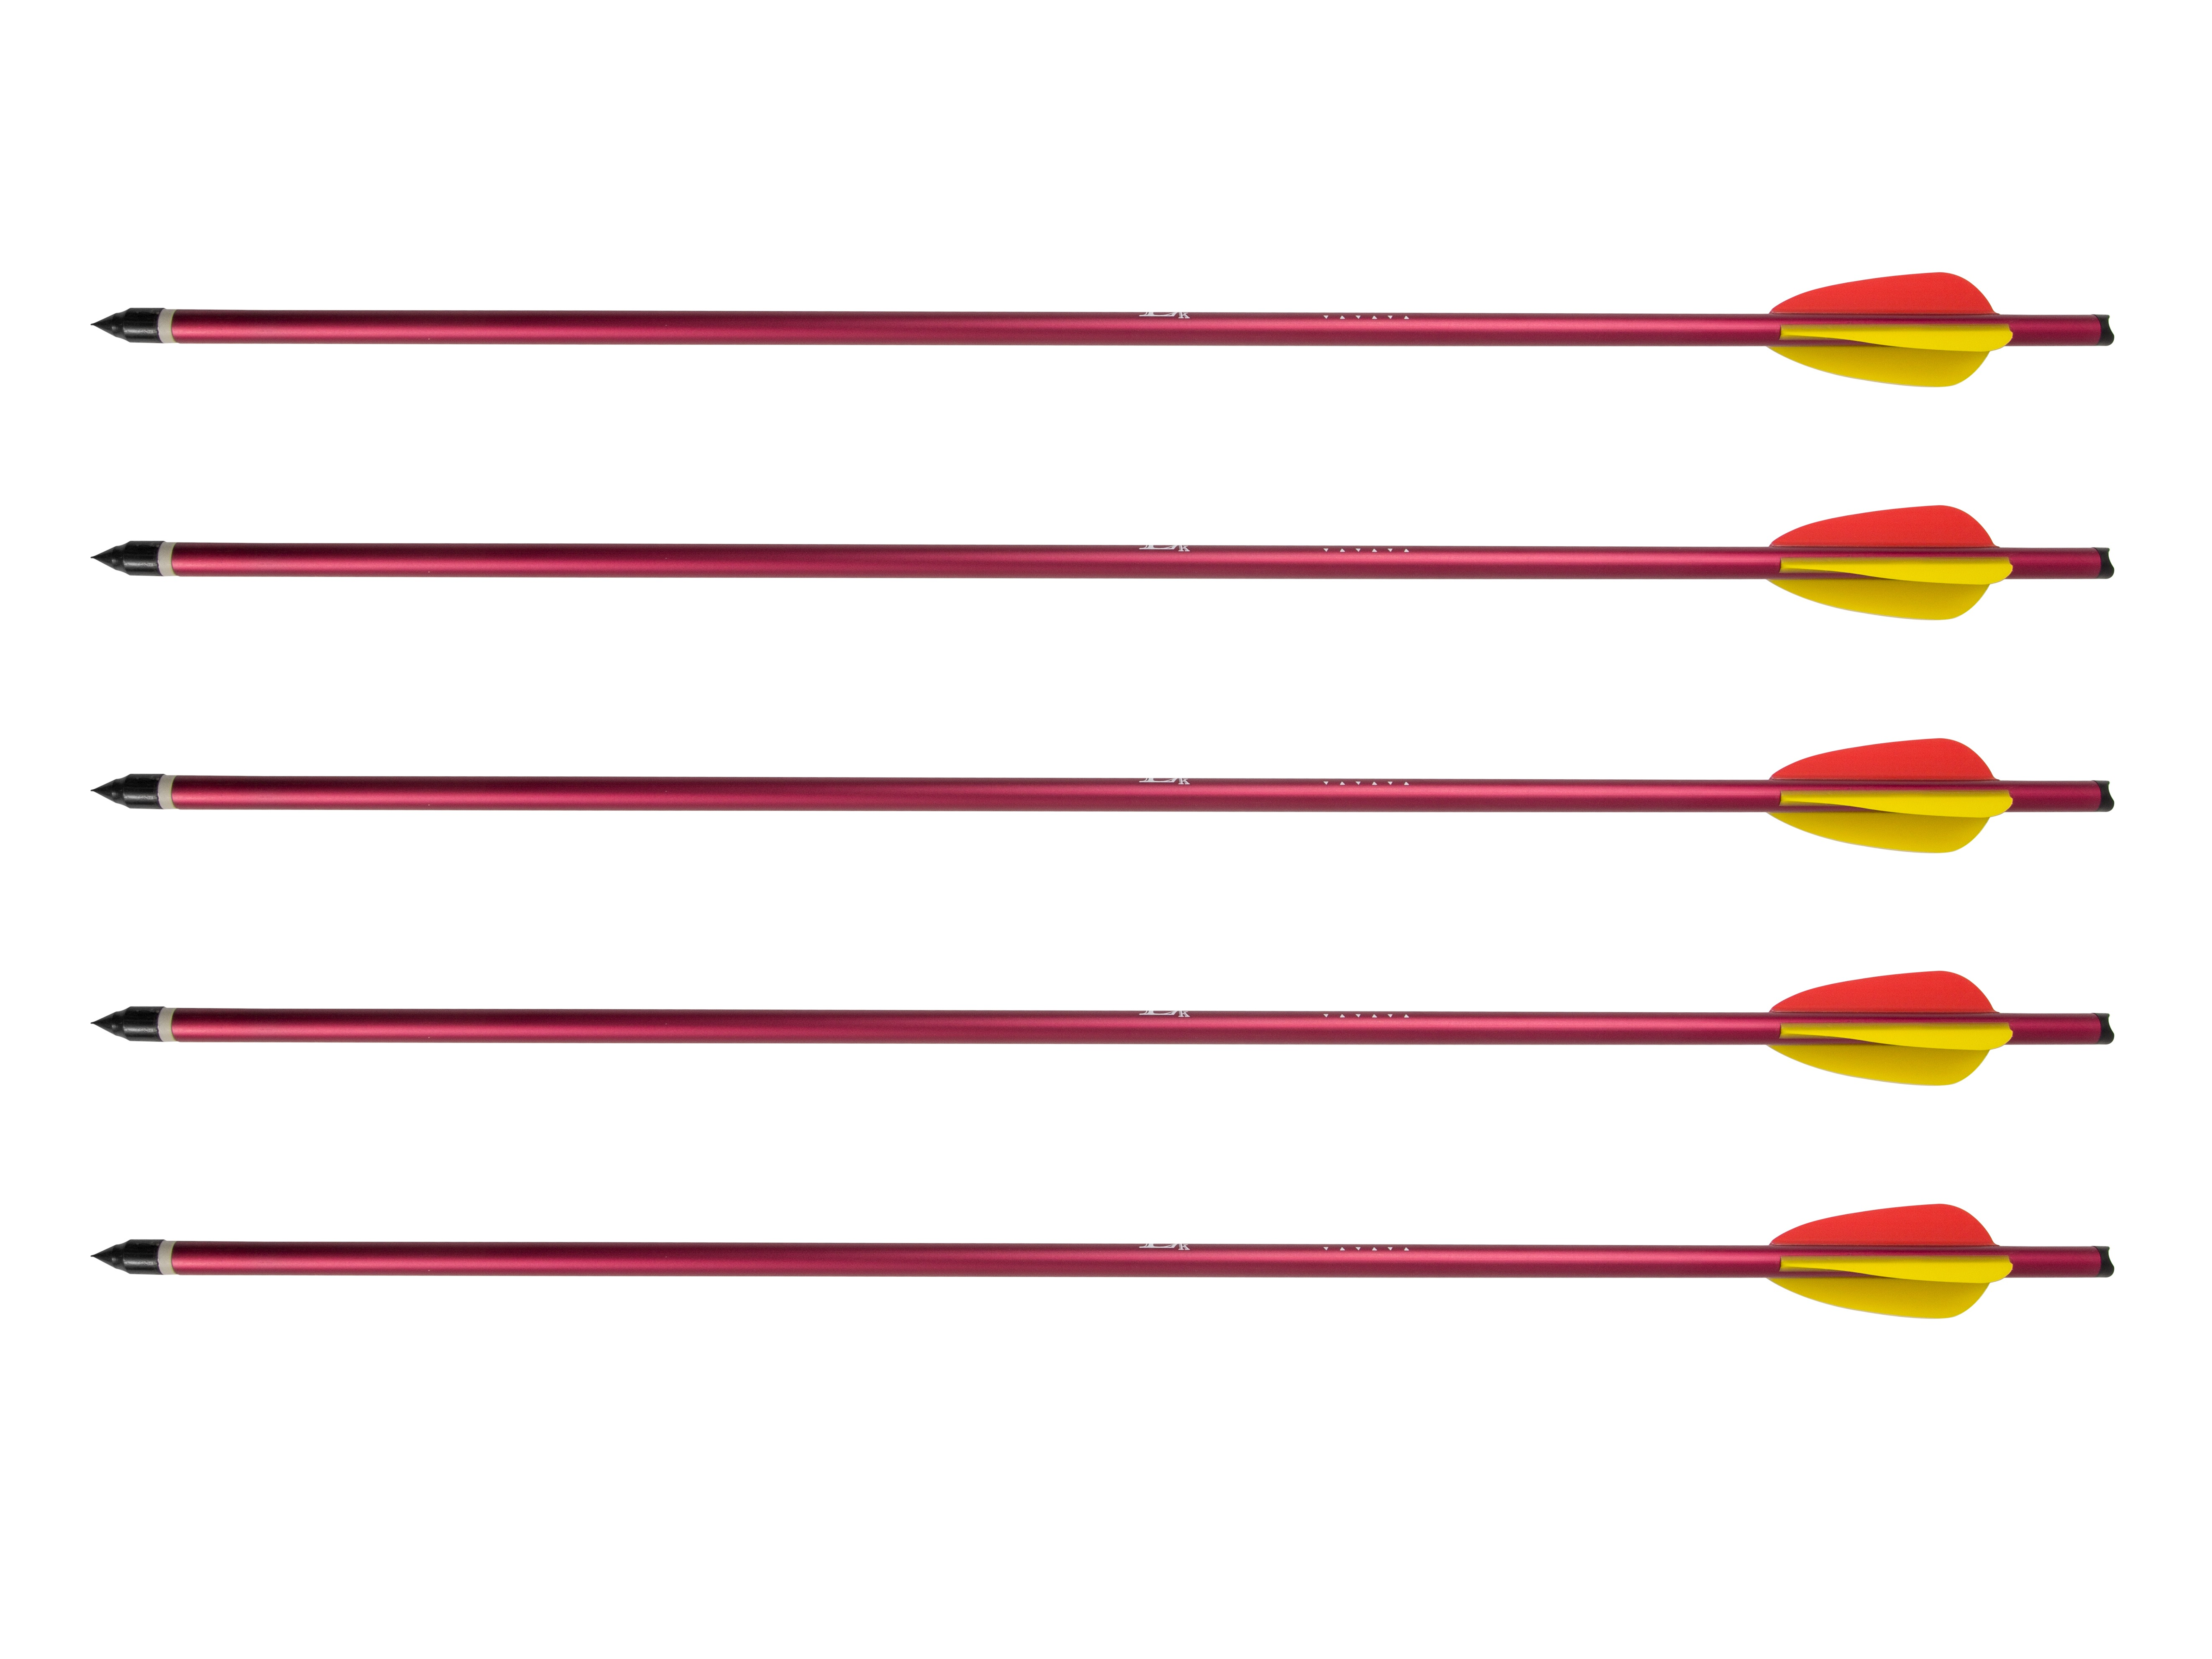 "Image of Bełt poe lang aluminiowy 20"" 5 szt. czerwony (076-229)"